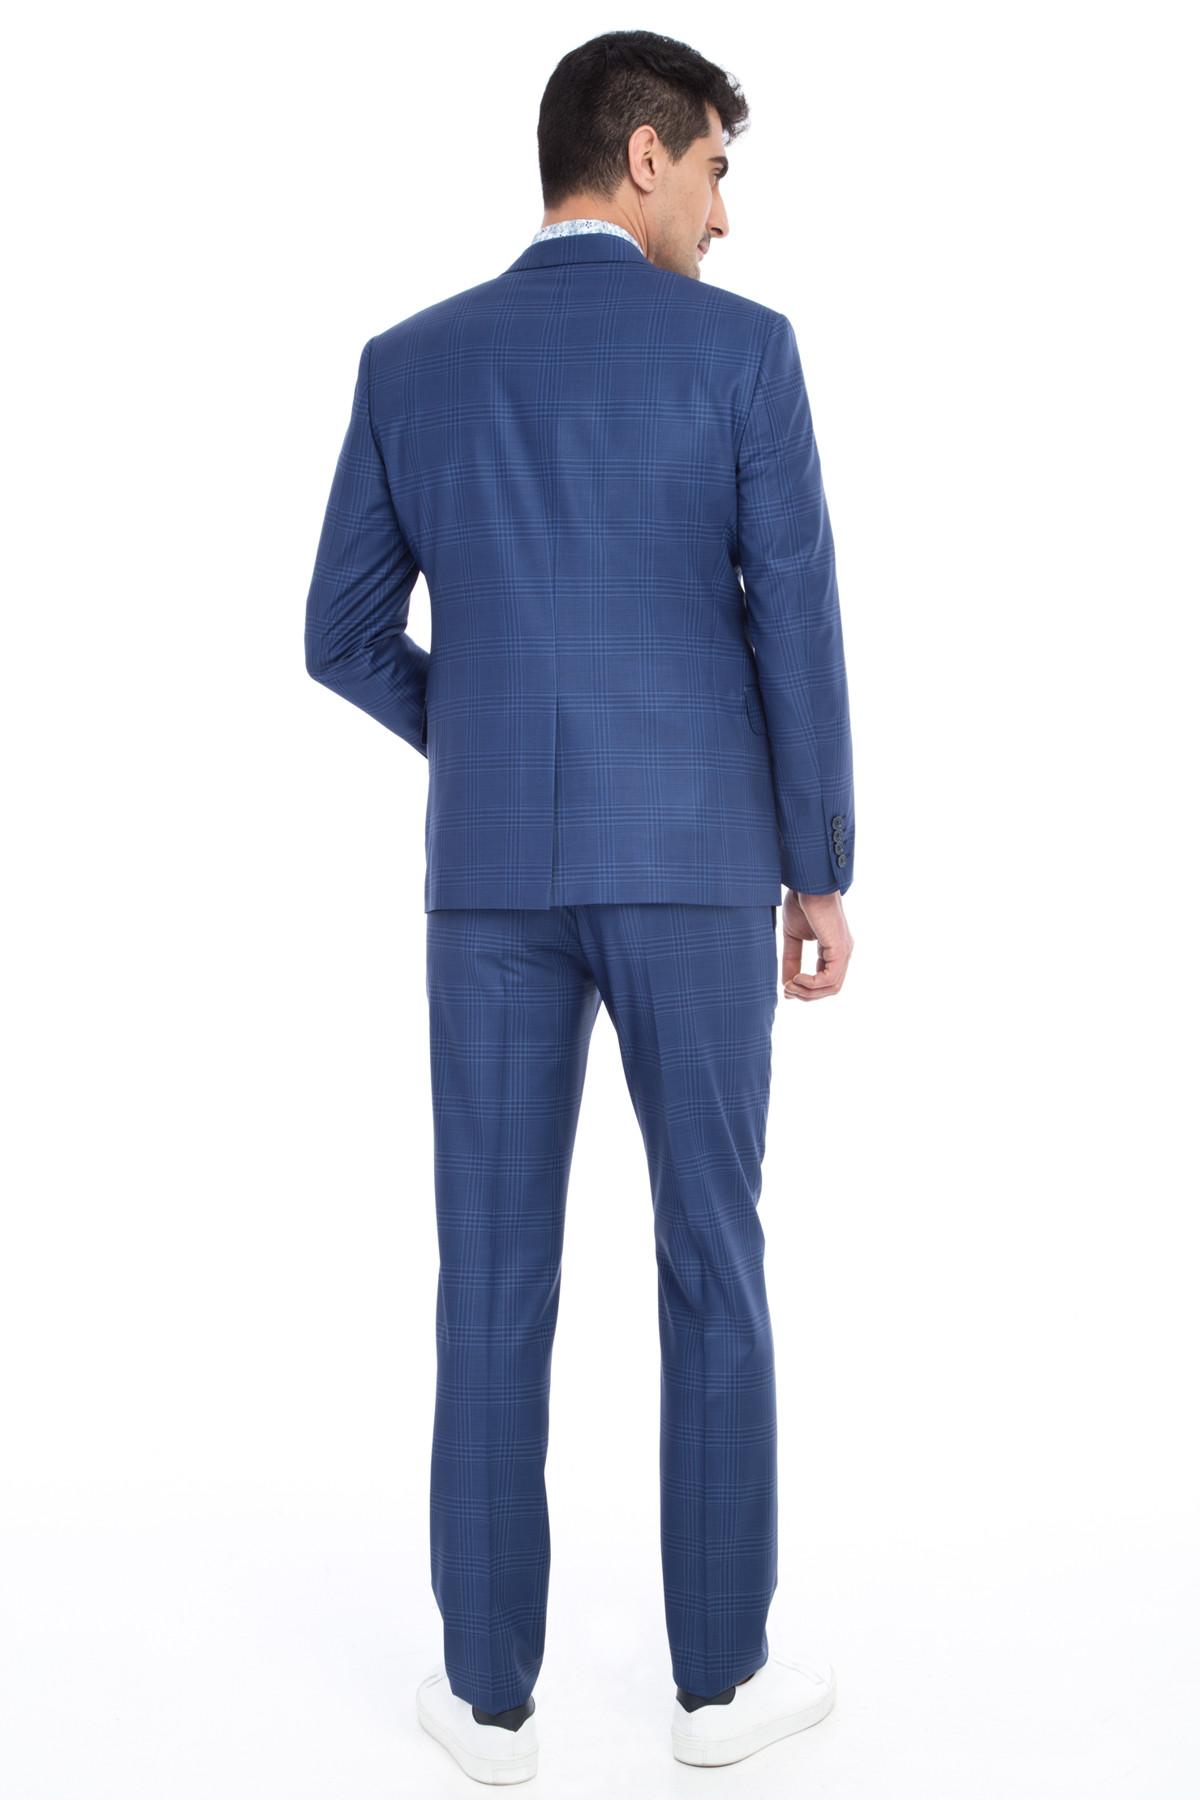 کت شلوار مردانه برند Kiğılı رنگ آبی کد ty4695085